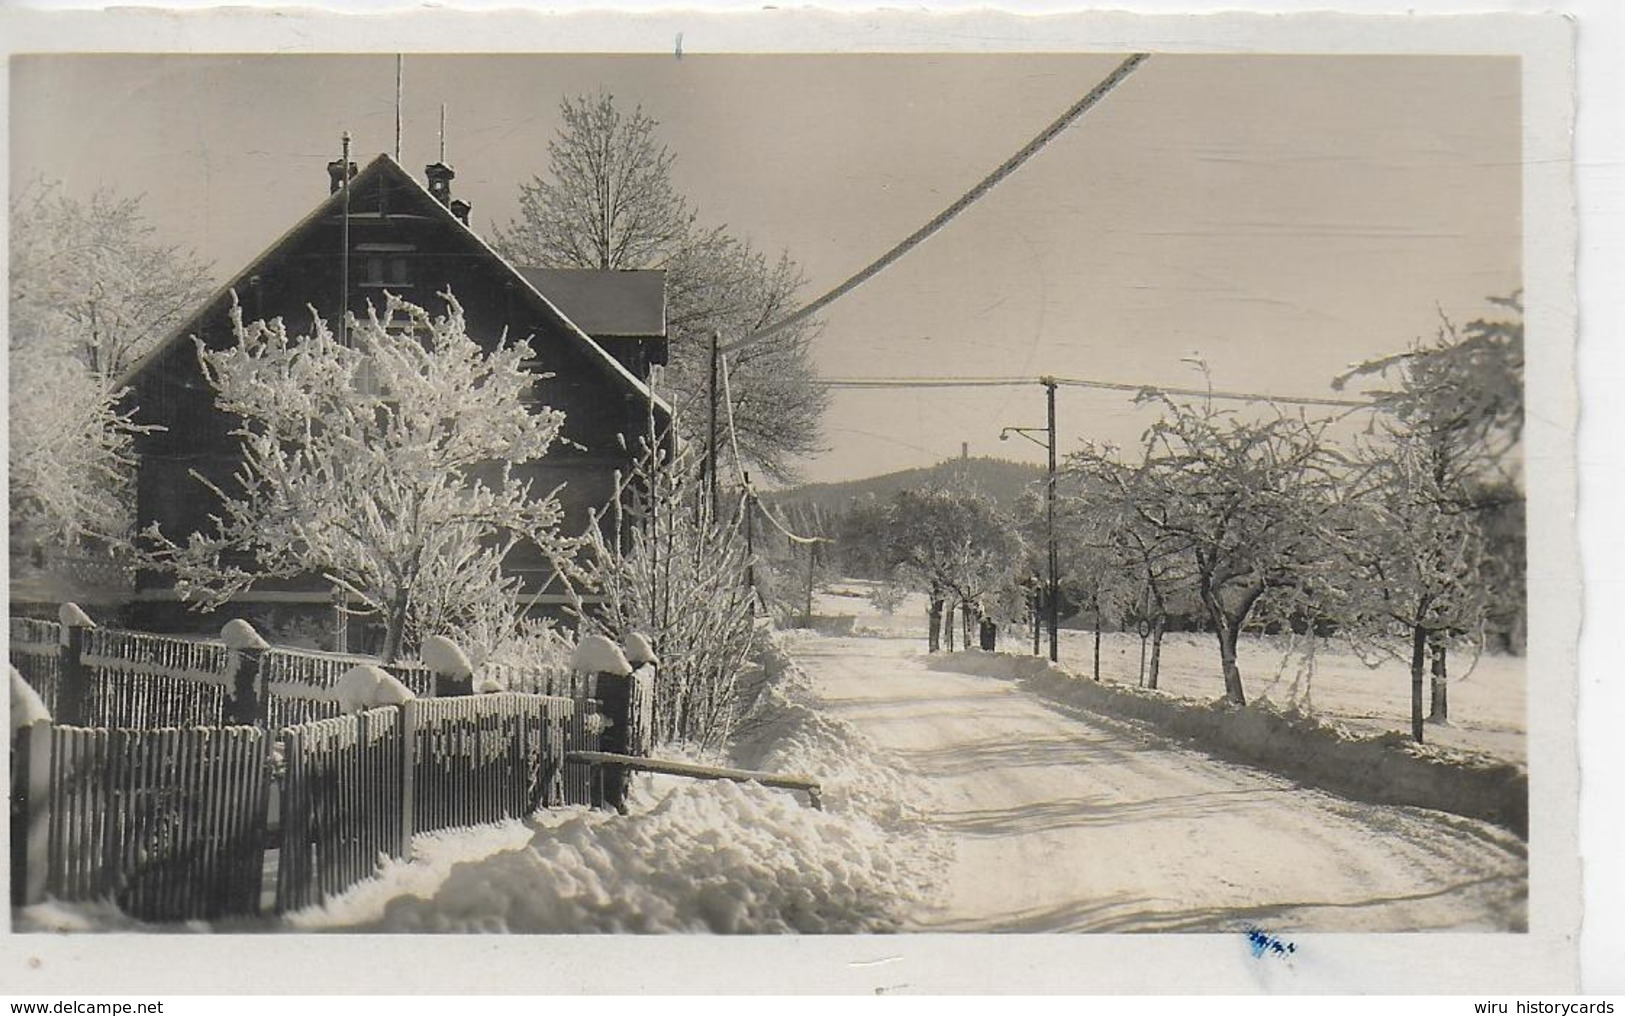 AK 0233  Jonsbach Mit Dem Hochwald - Ostalgie , DDR Um 1951 - Zittau